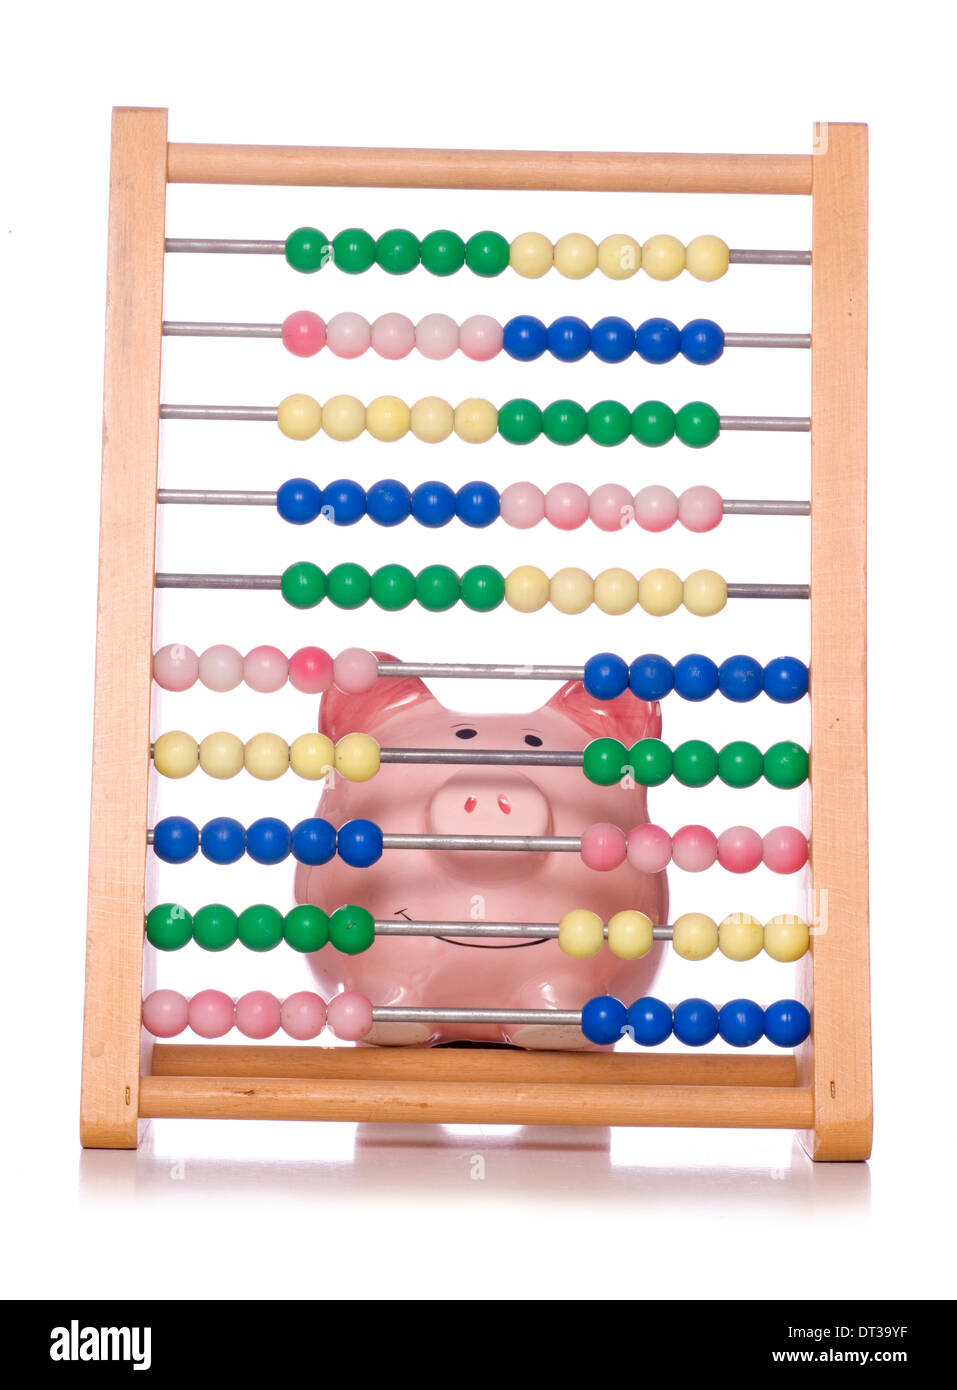 Berechnung der Finanzen Sparschwein Ausschnitt Stockbild